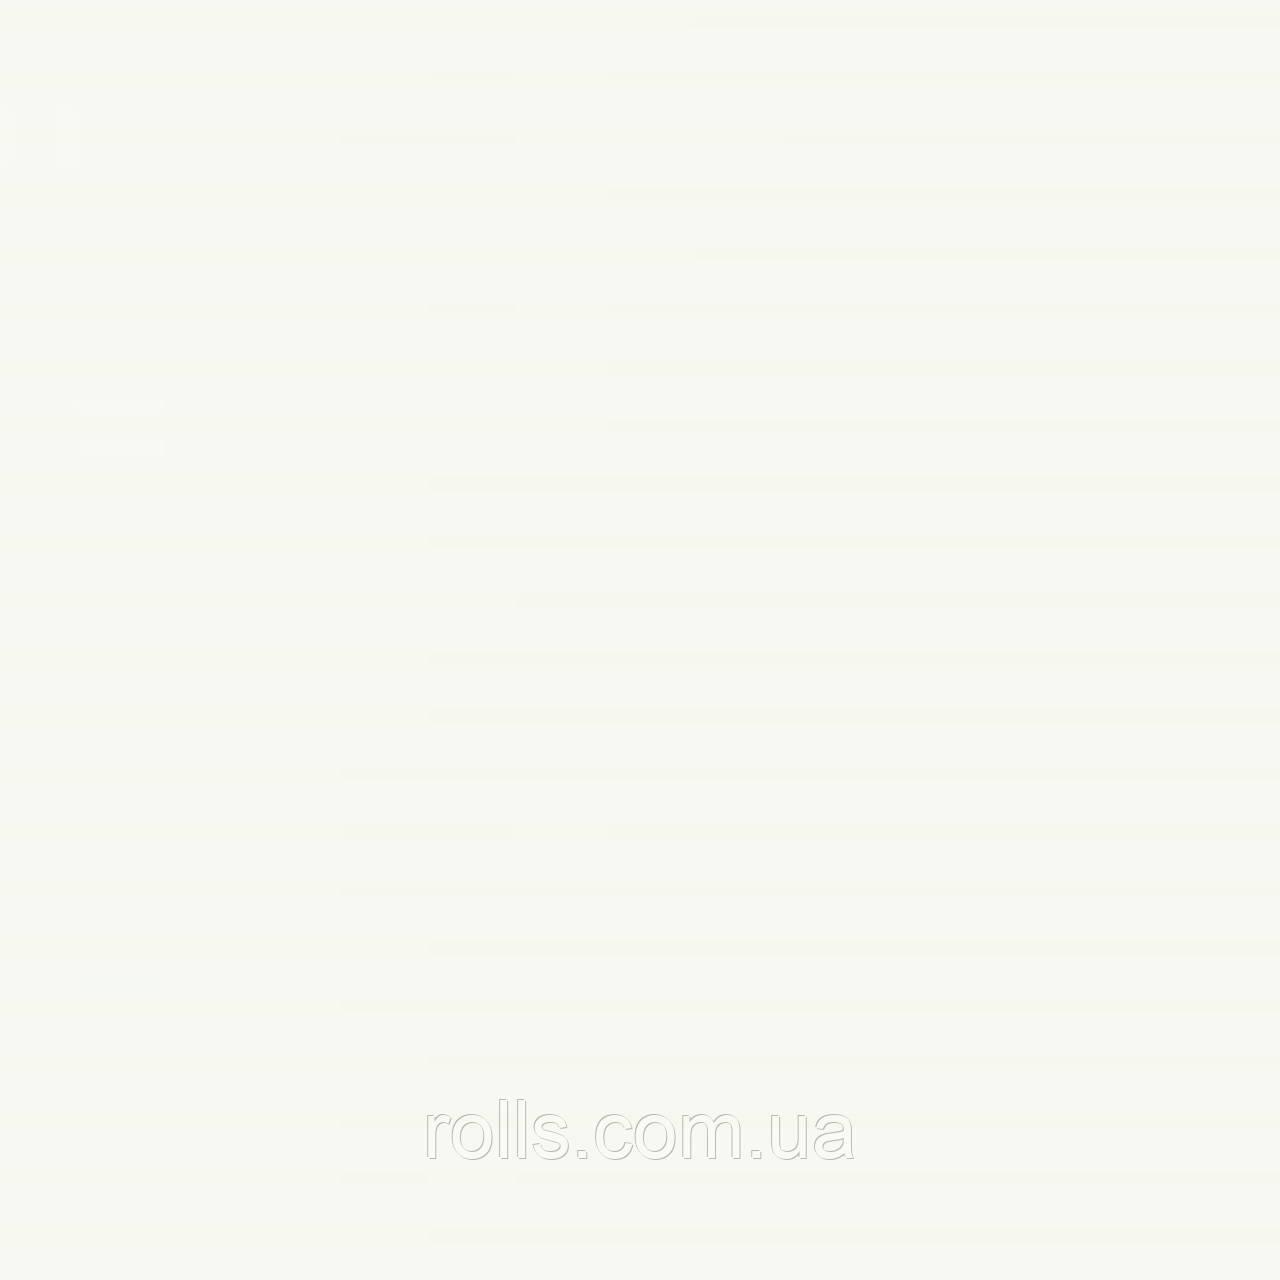 "Лист алюминиевый плоский PREFALZ №17 REINWEISS ""БЕЛЫЙ ЧИСТЫЙ"" RAL9010 ""PURE WHITE"" 0,7х1000х2000мм"